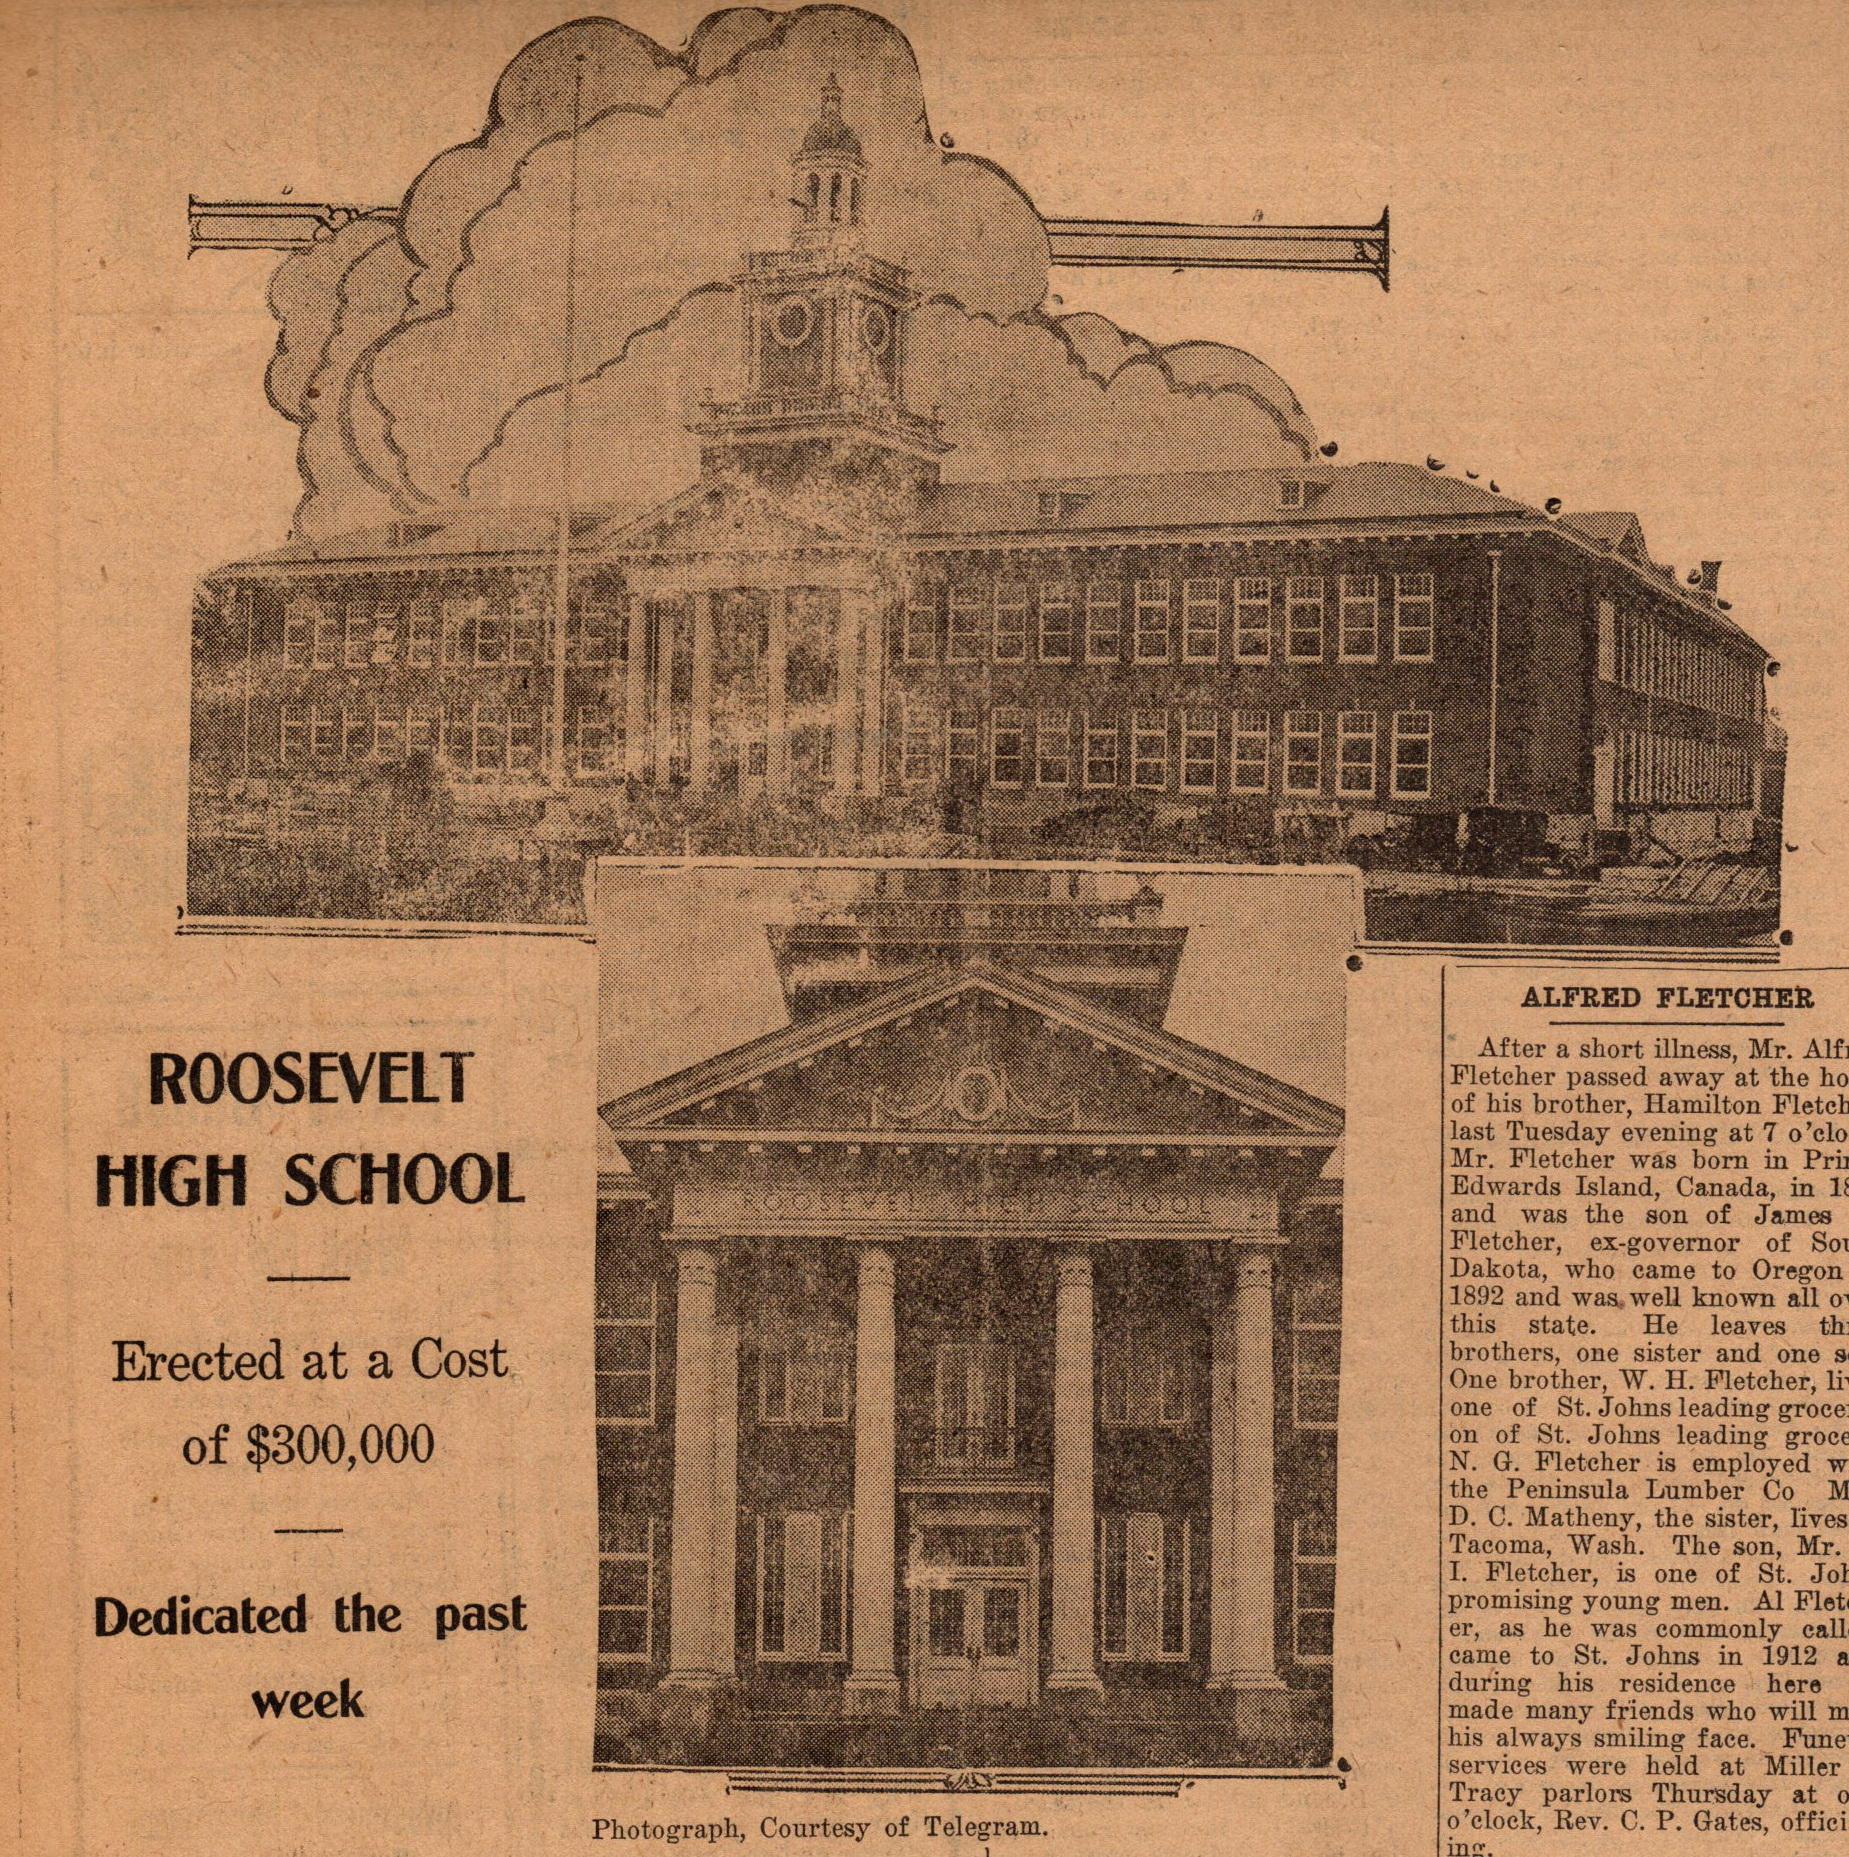 new-roosevelt-high-school-opened-jan-25-1923-1